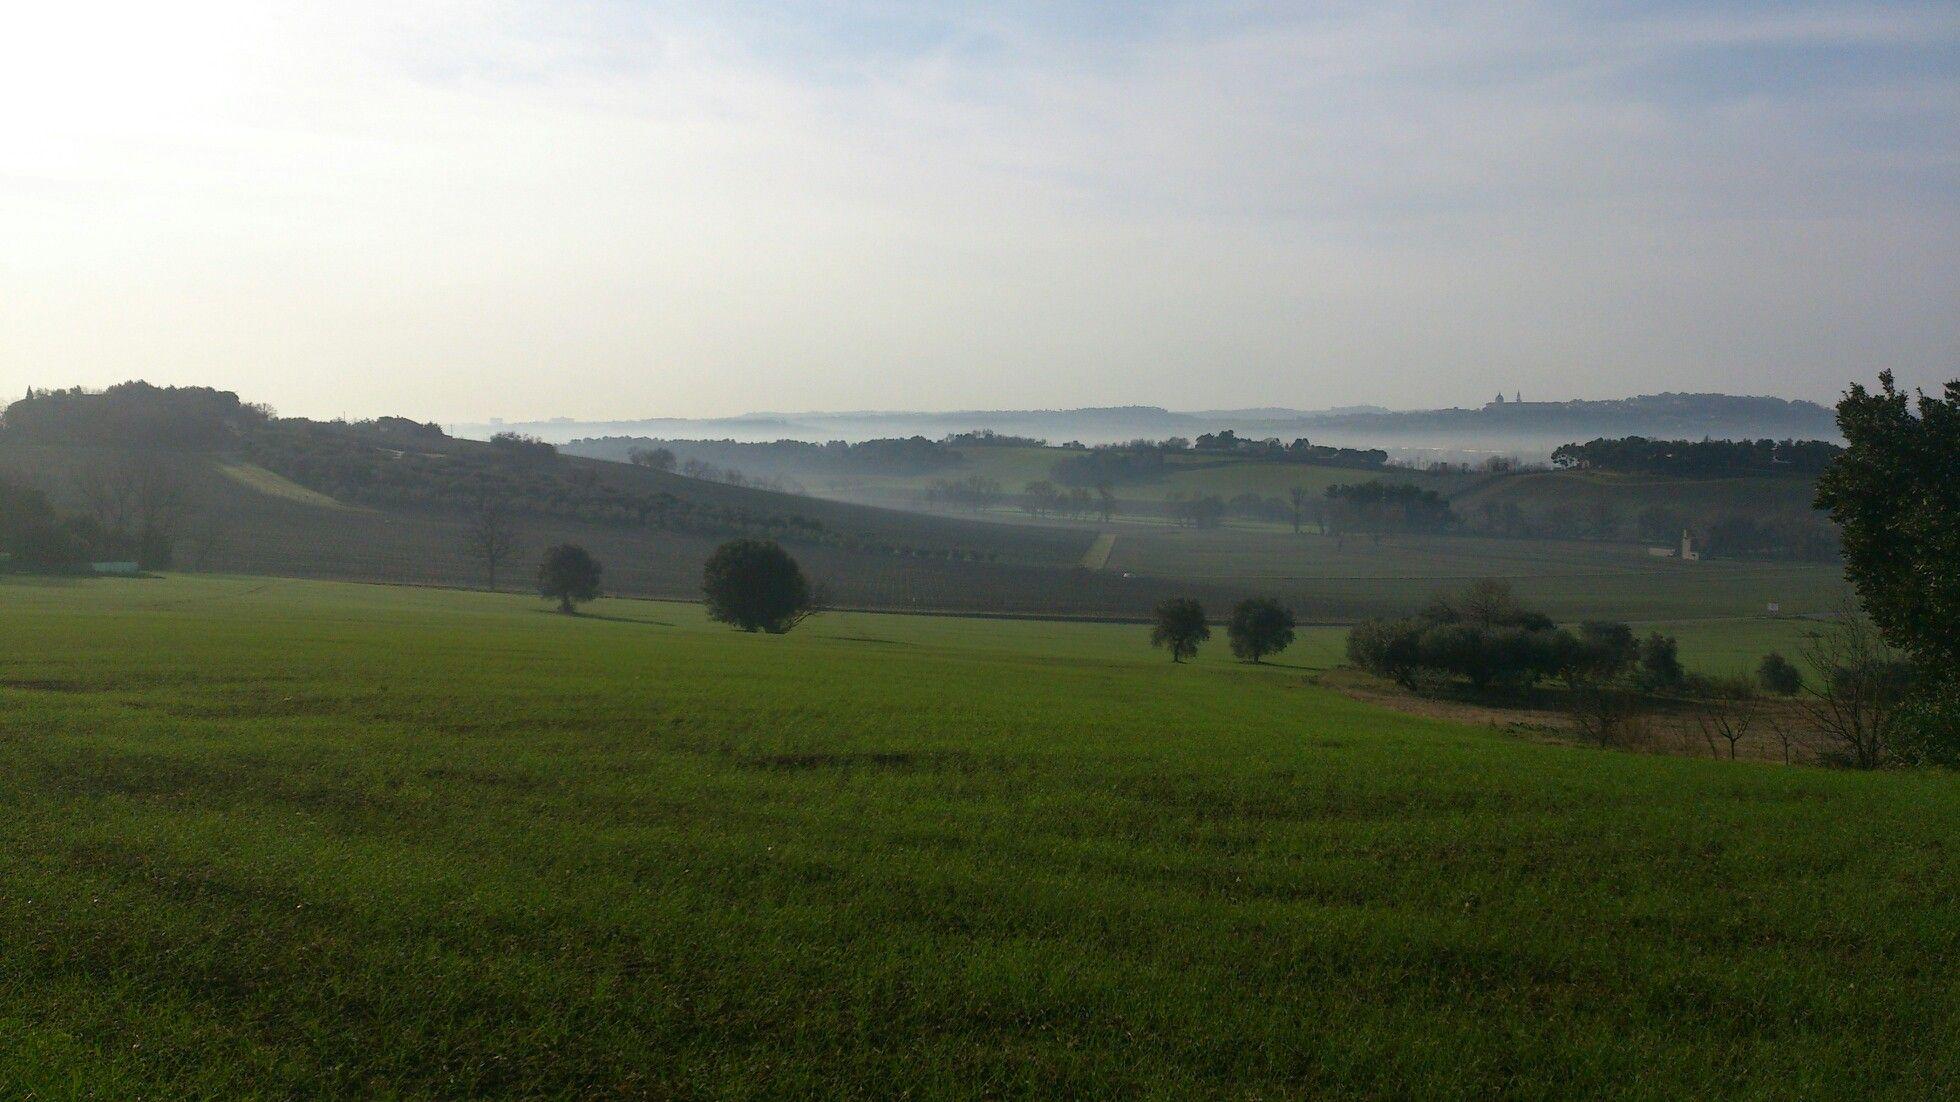 Le Marche countryside